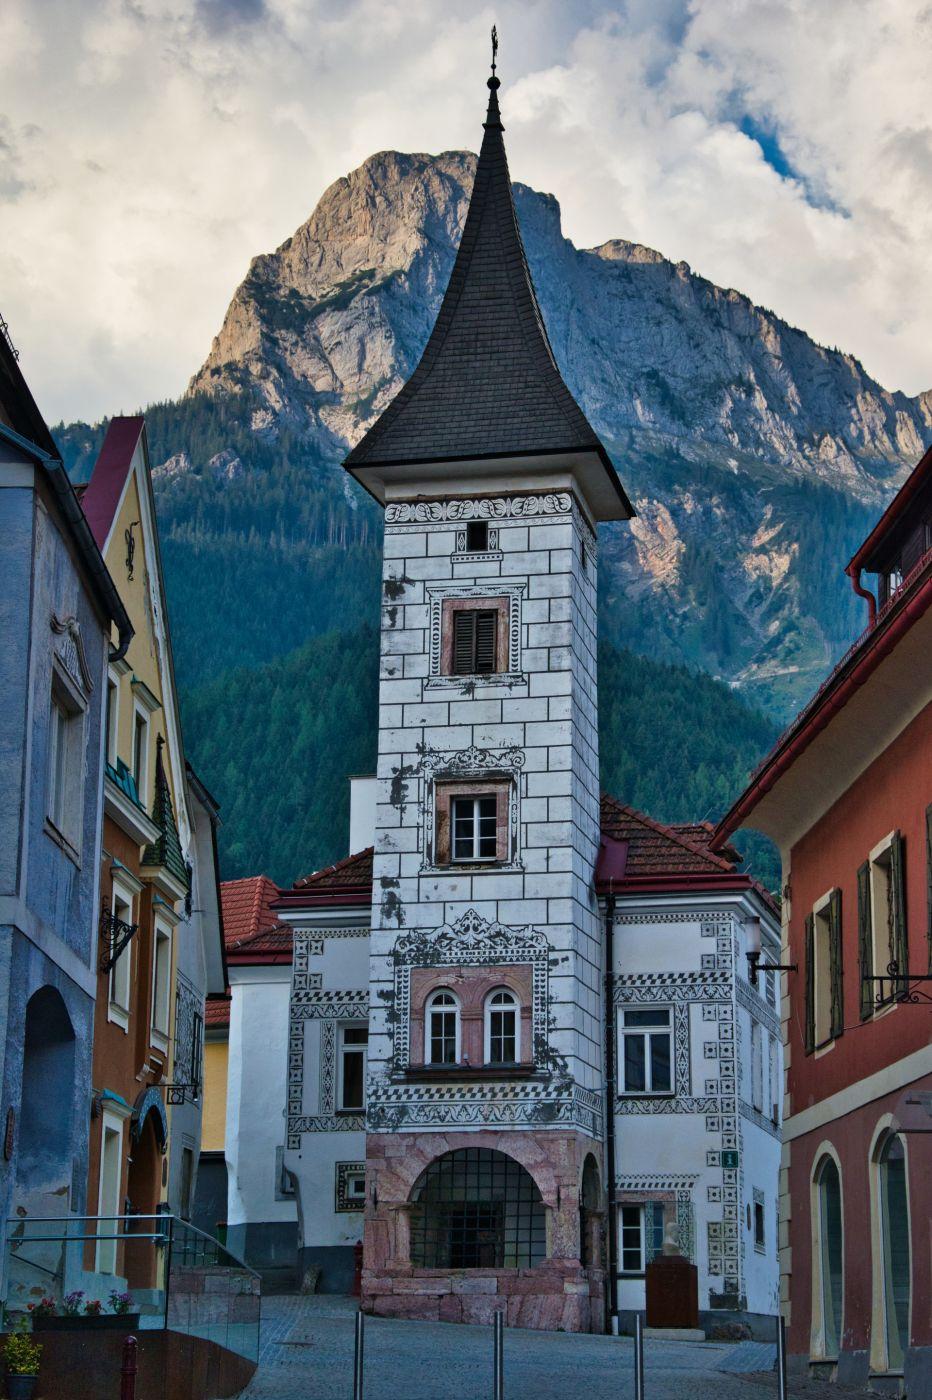 Altes Rathaus in Eisenerz, Austria